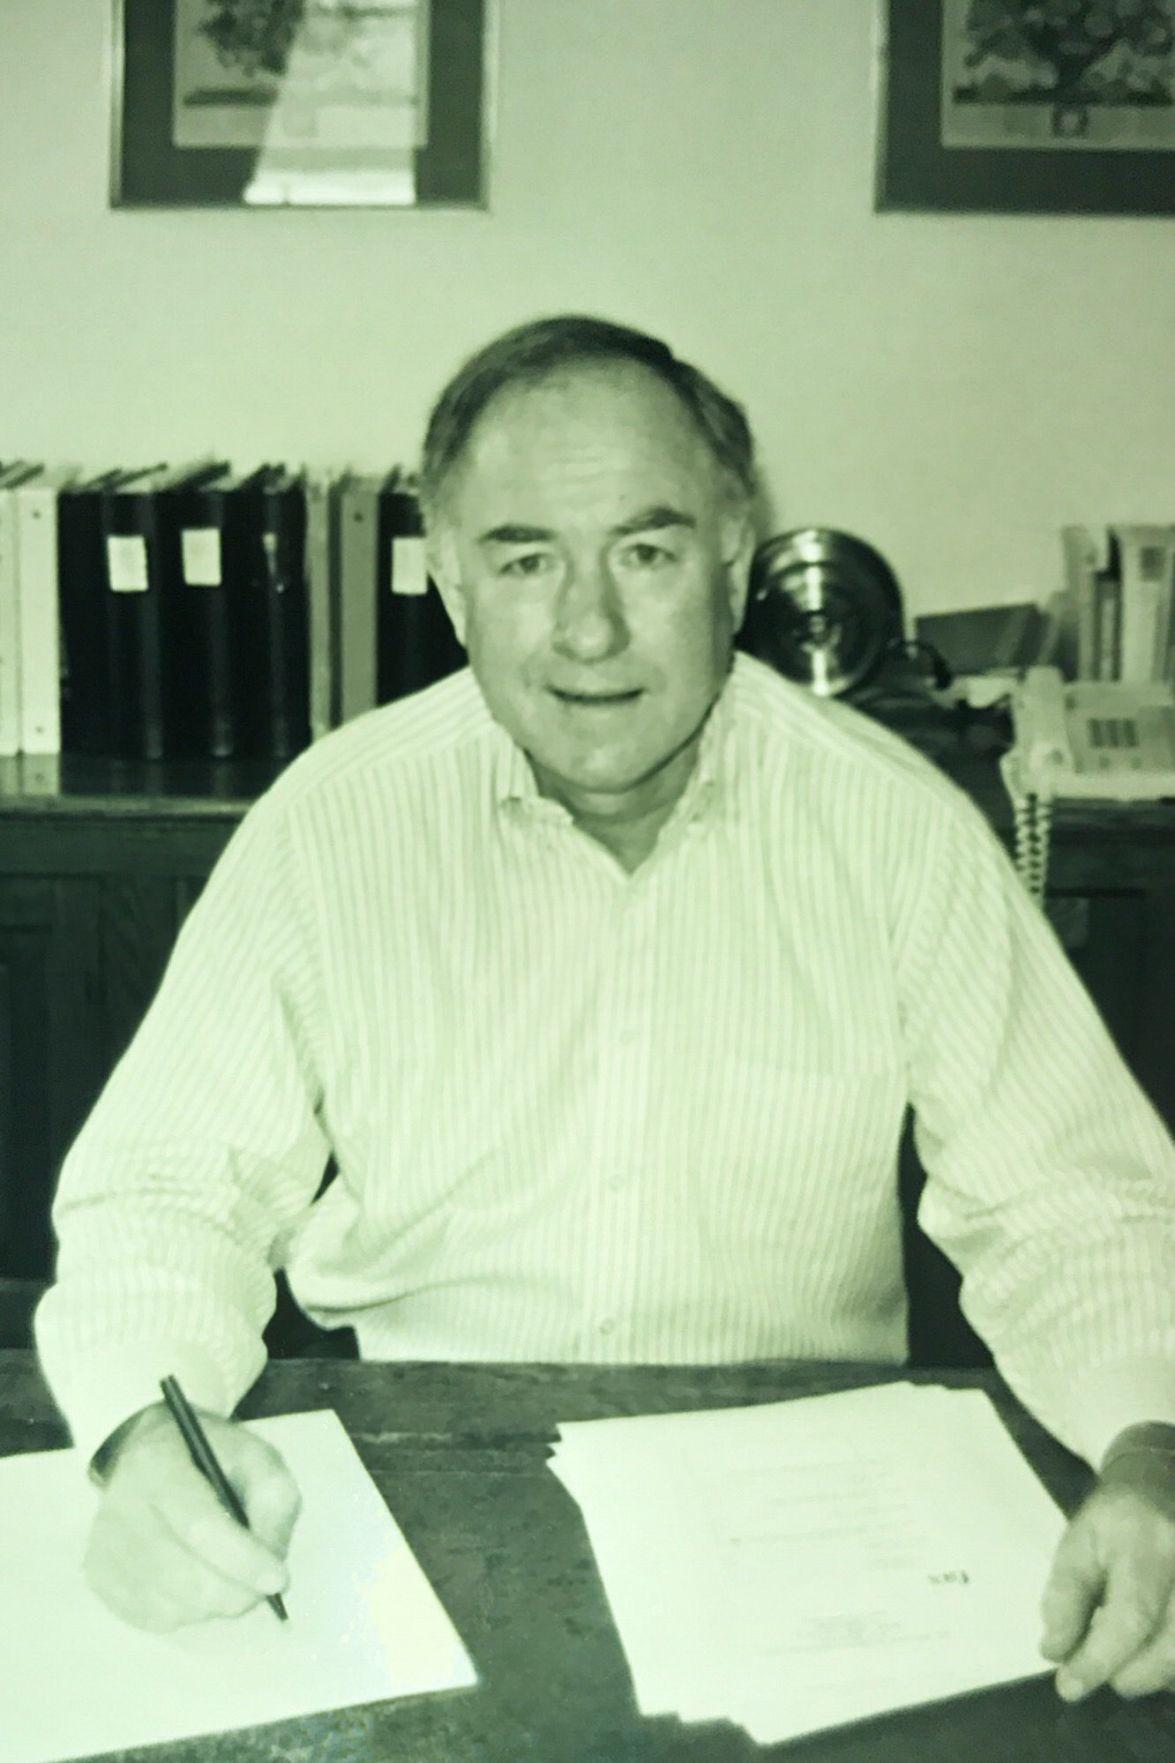 The late John Brown, former St. Helena mayor